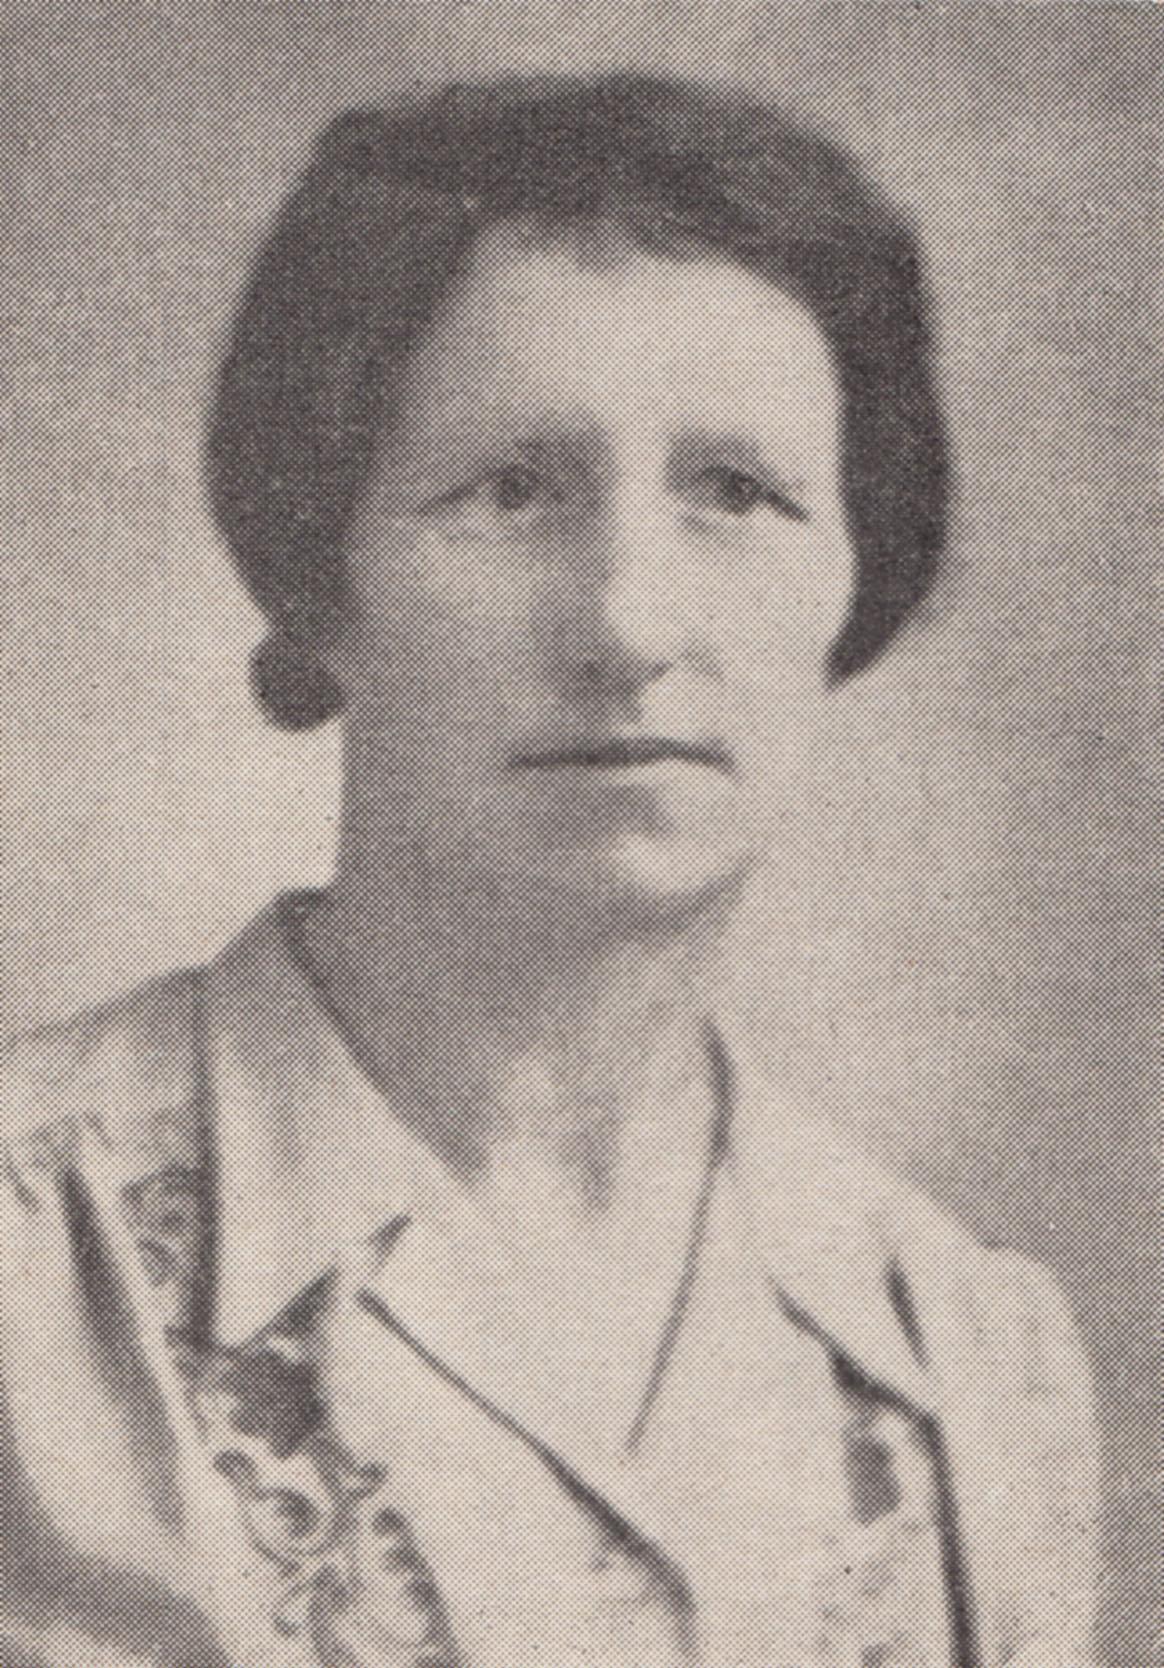 Maria Pia Kobler-Stieger (1908-1955)